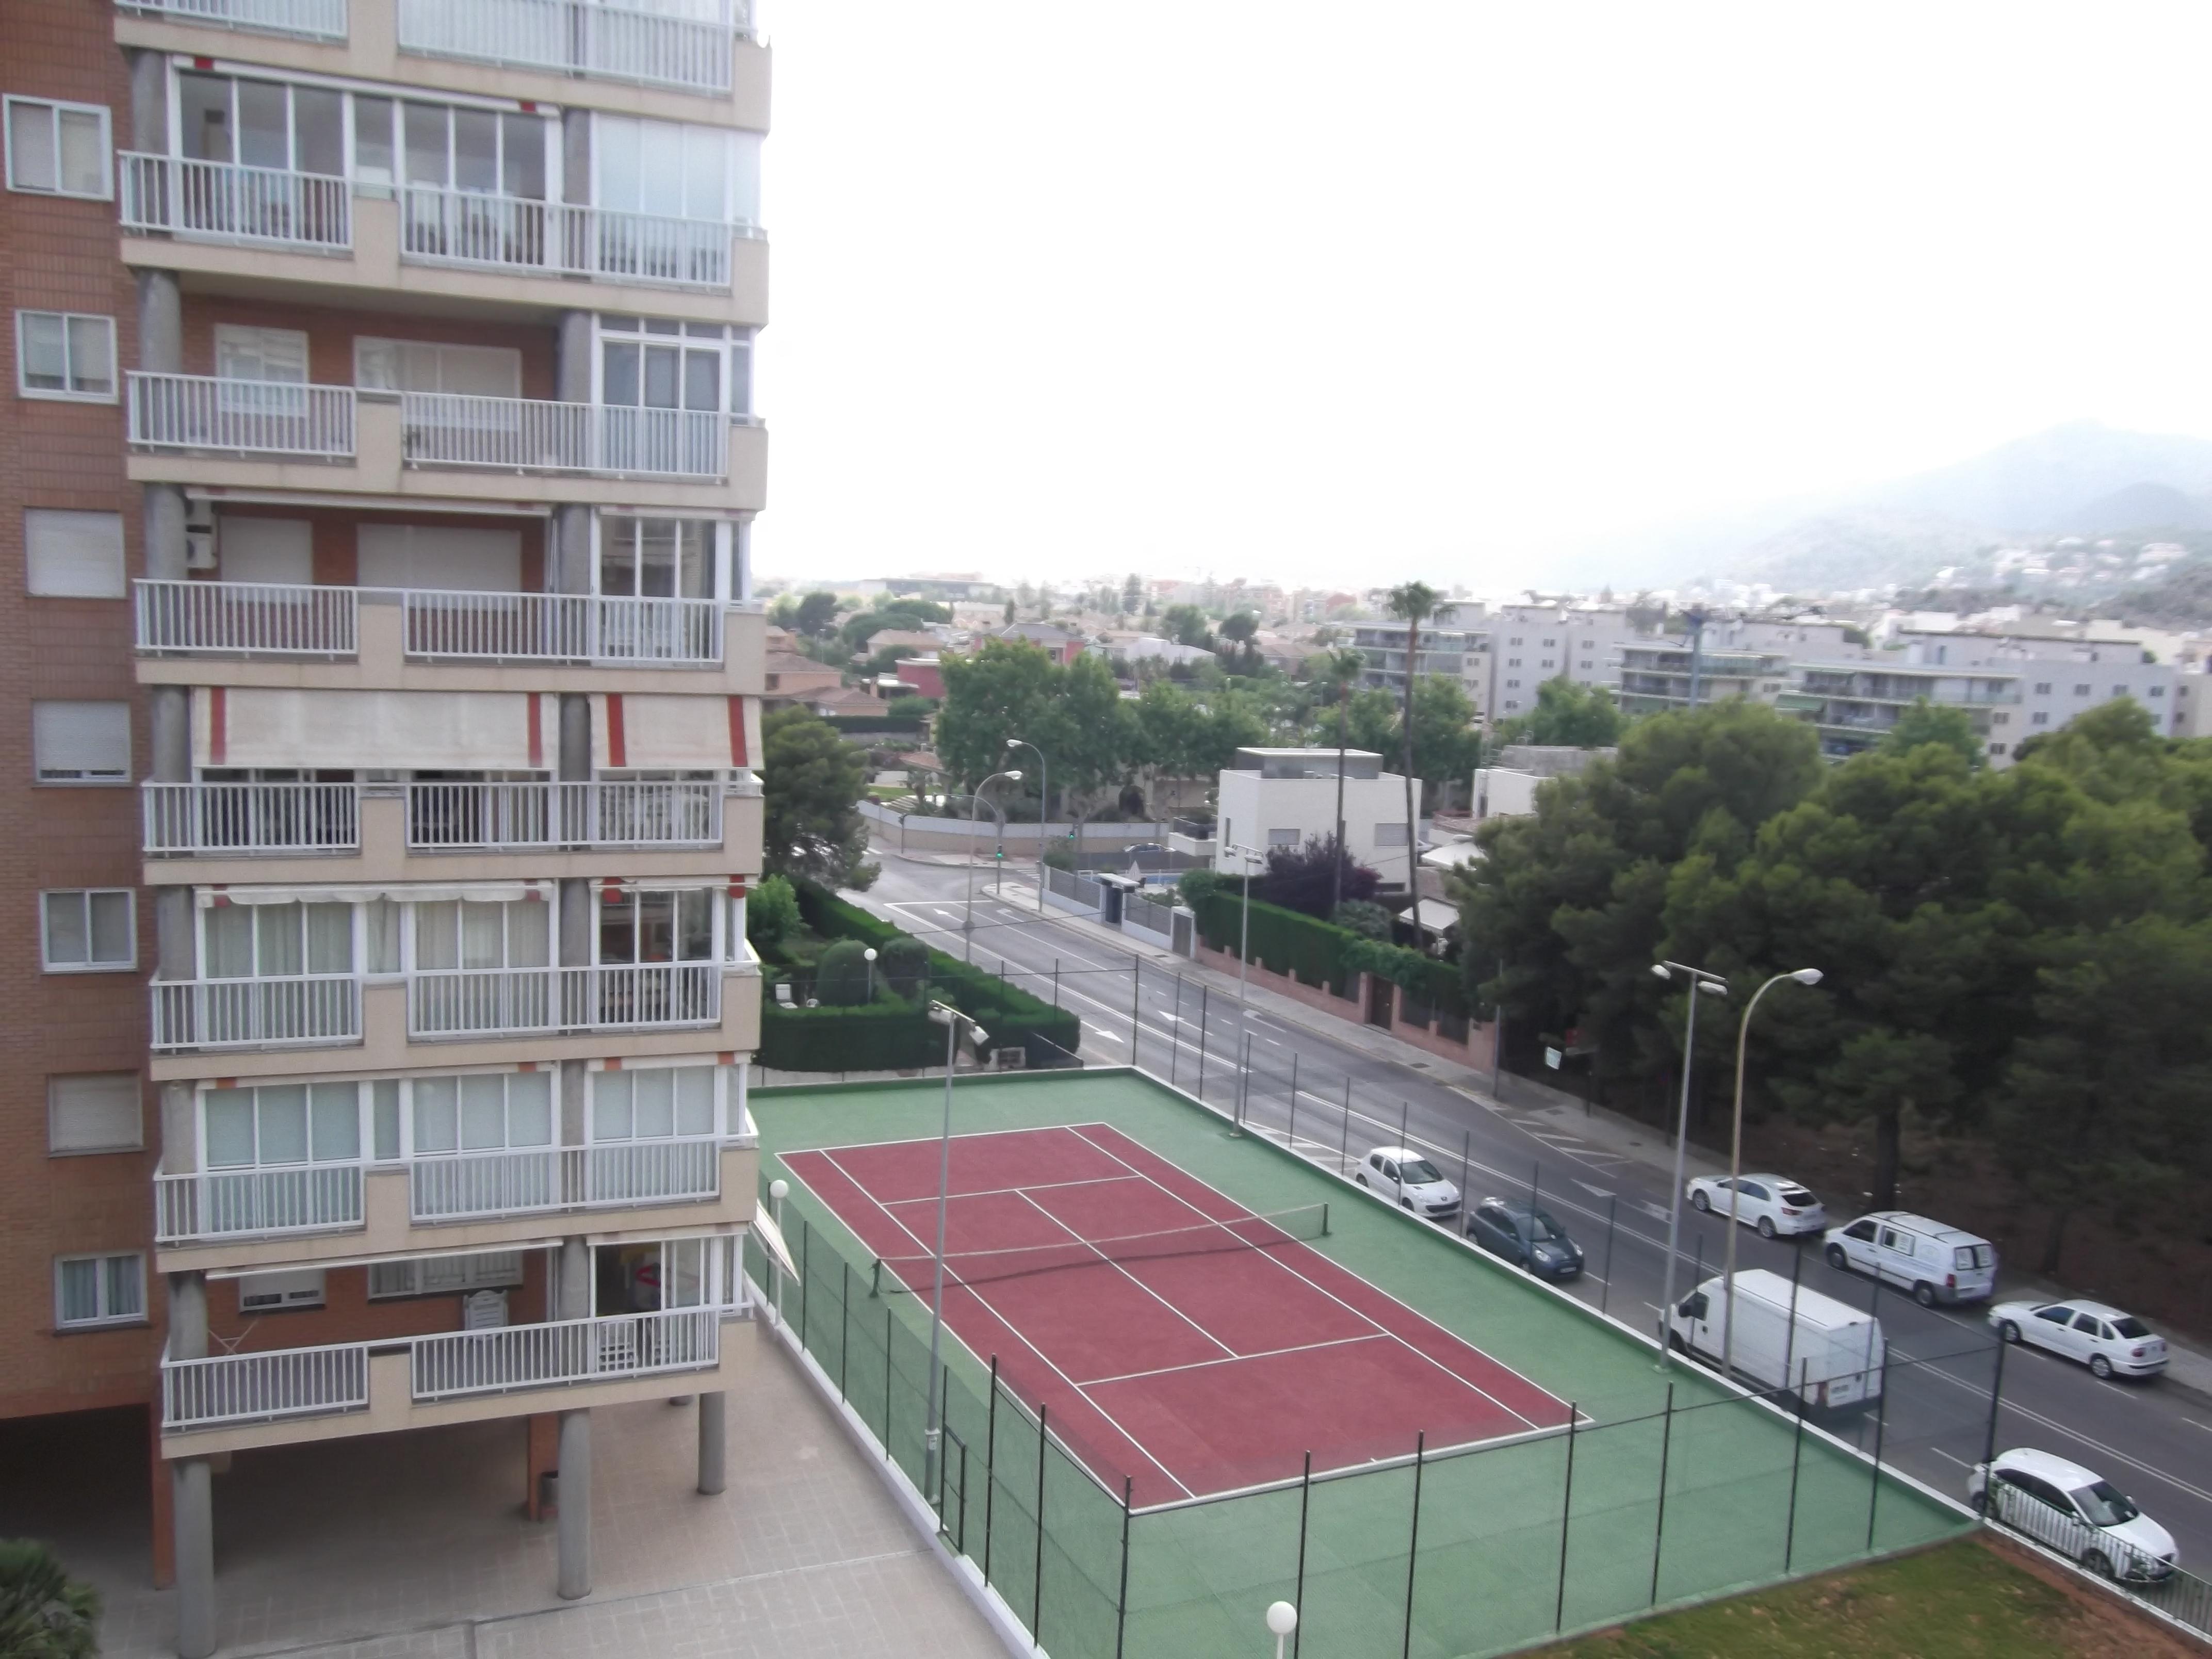 Vendo apartamento en benic sim for Piscinas milanuncios